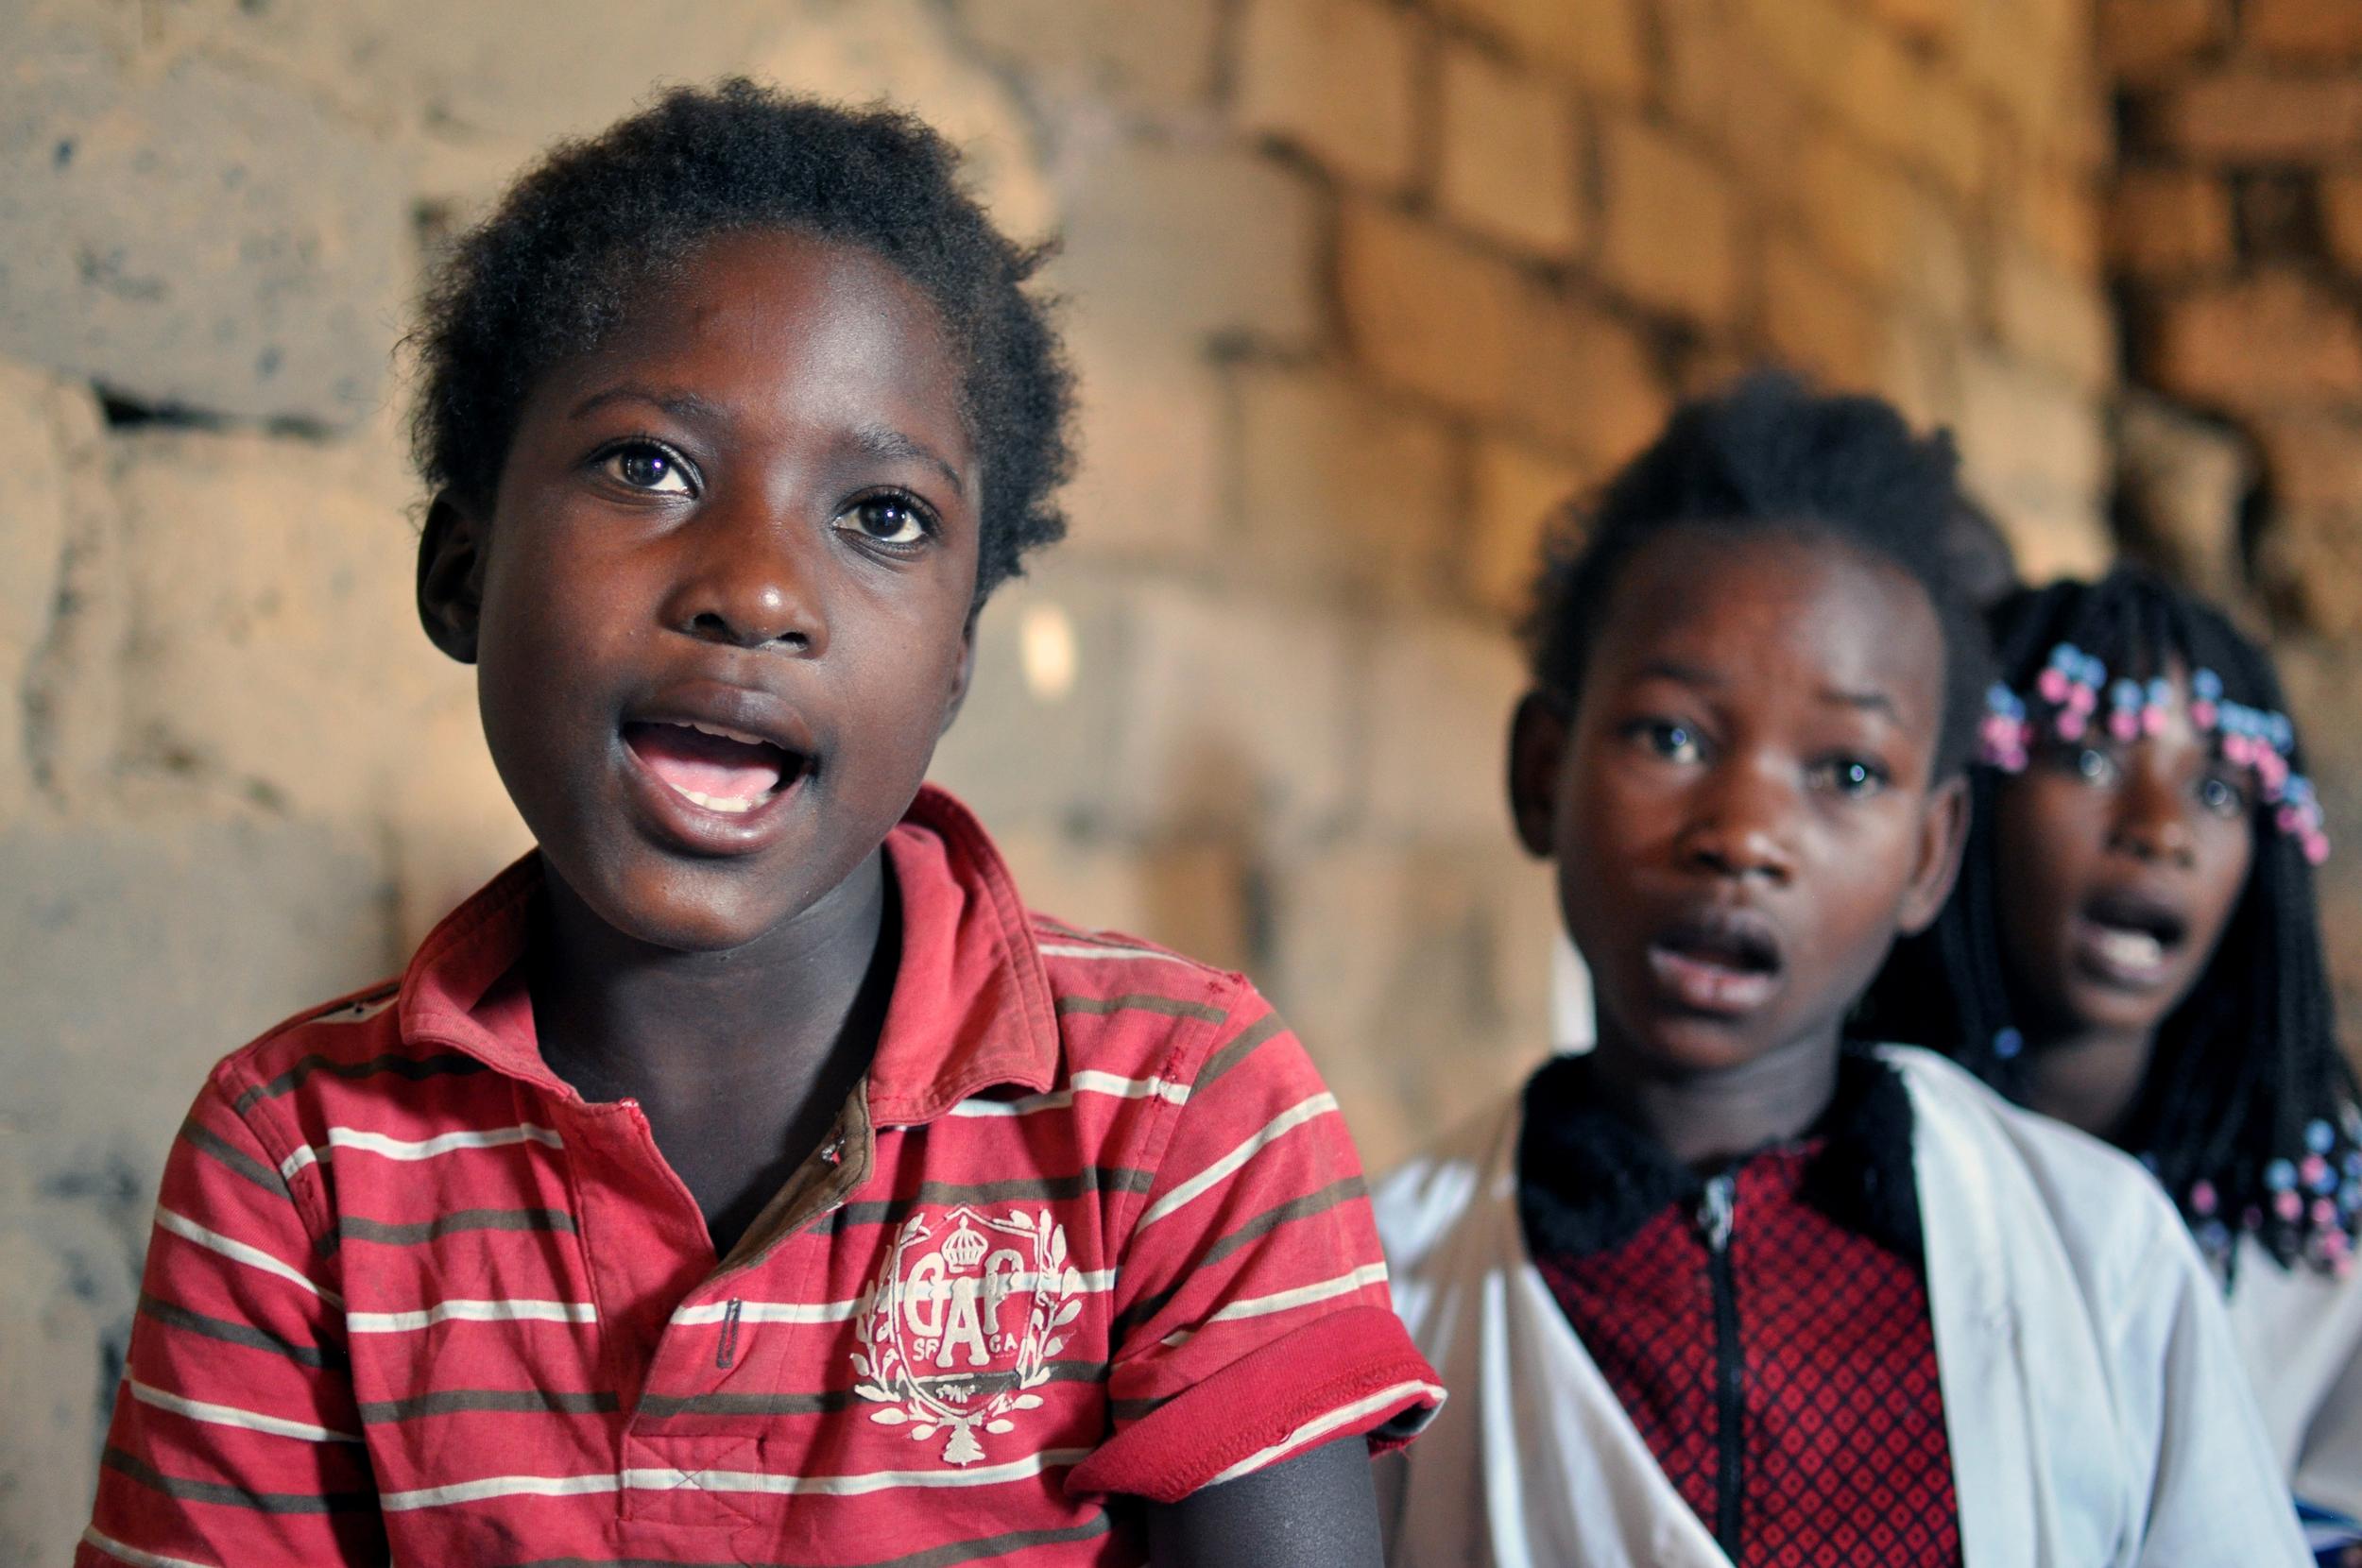 Primary school, Luanda